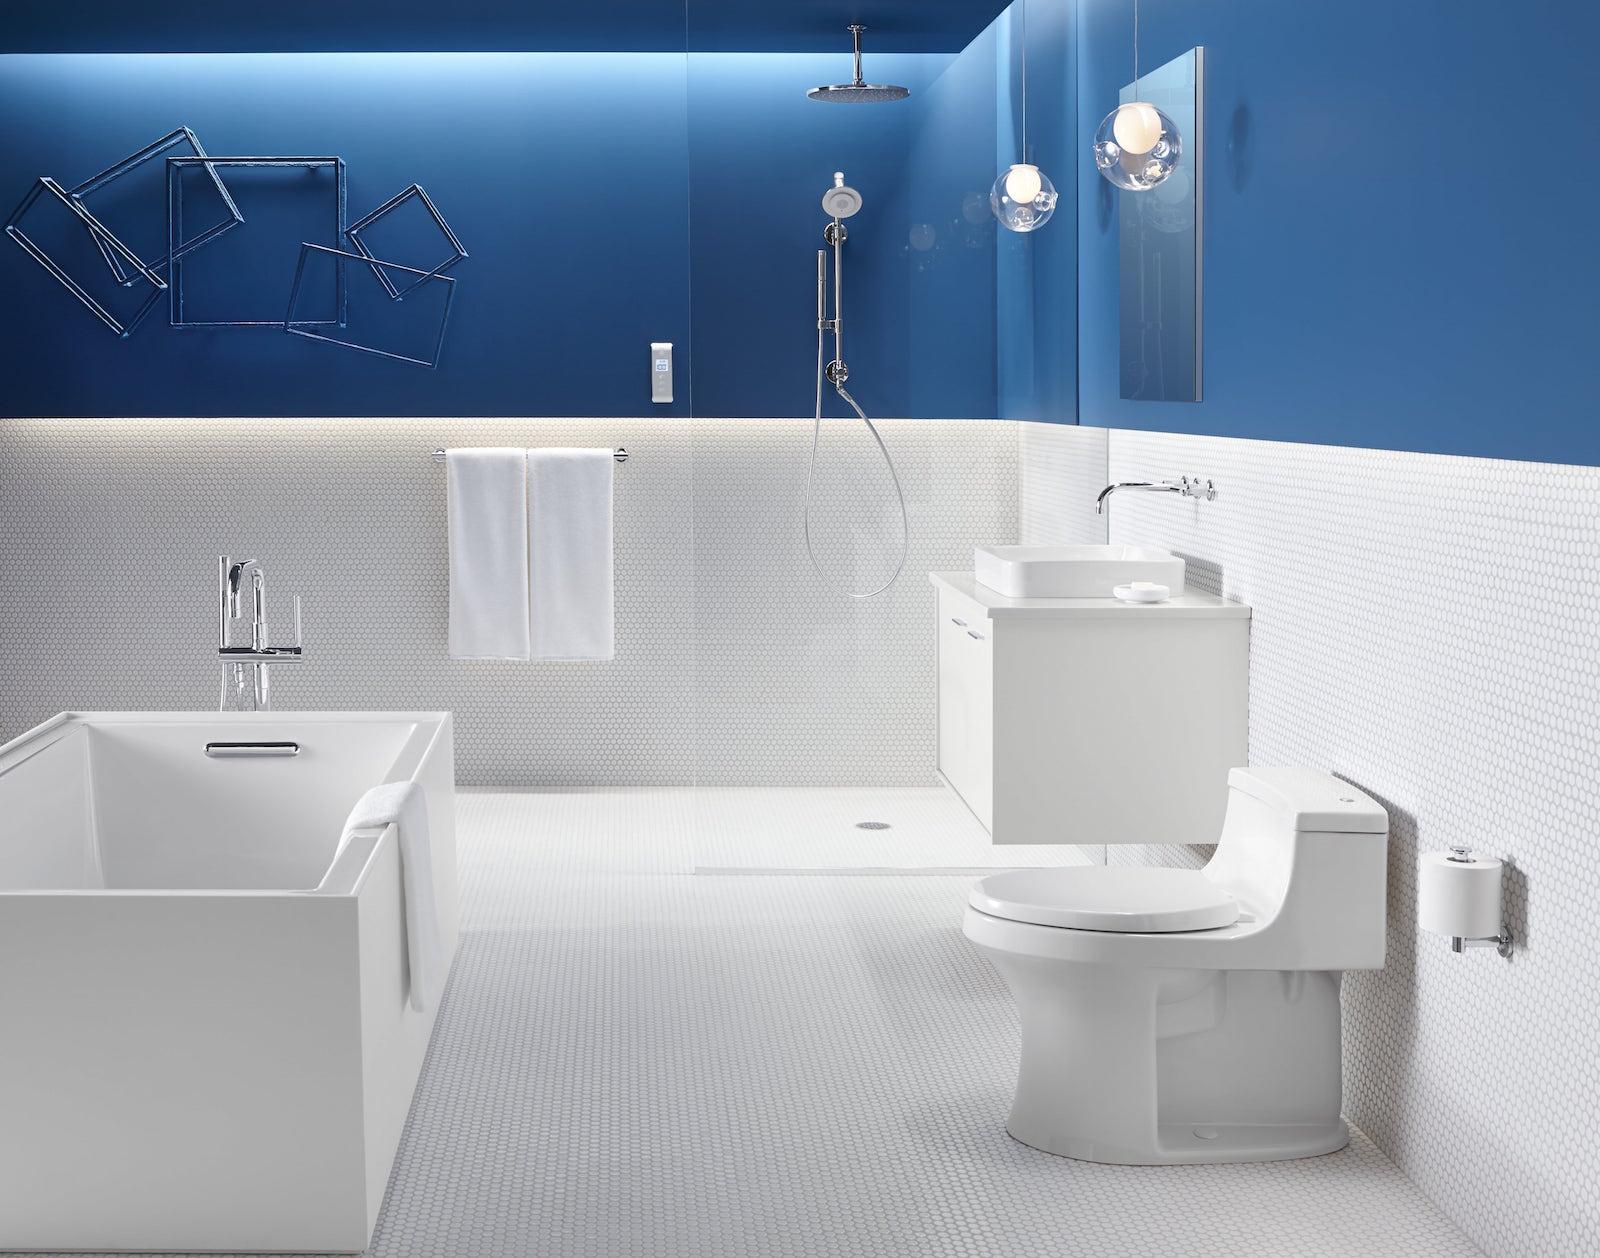 A Modern Bathroom Design